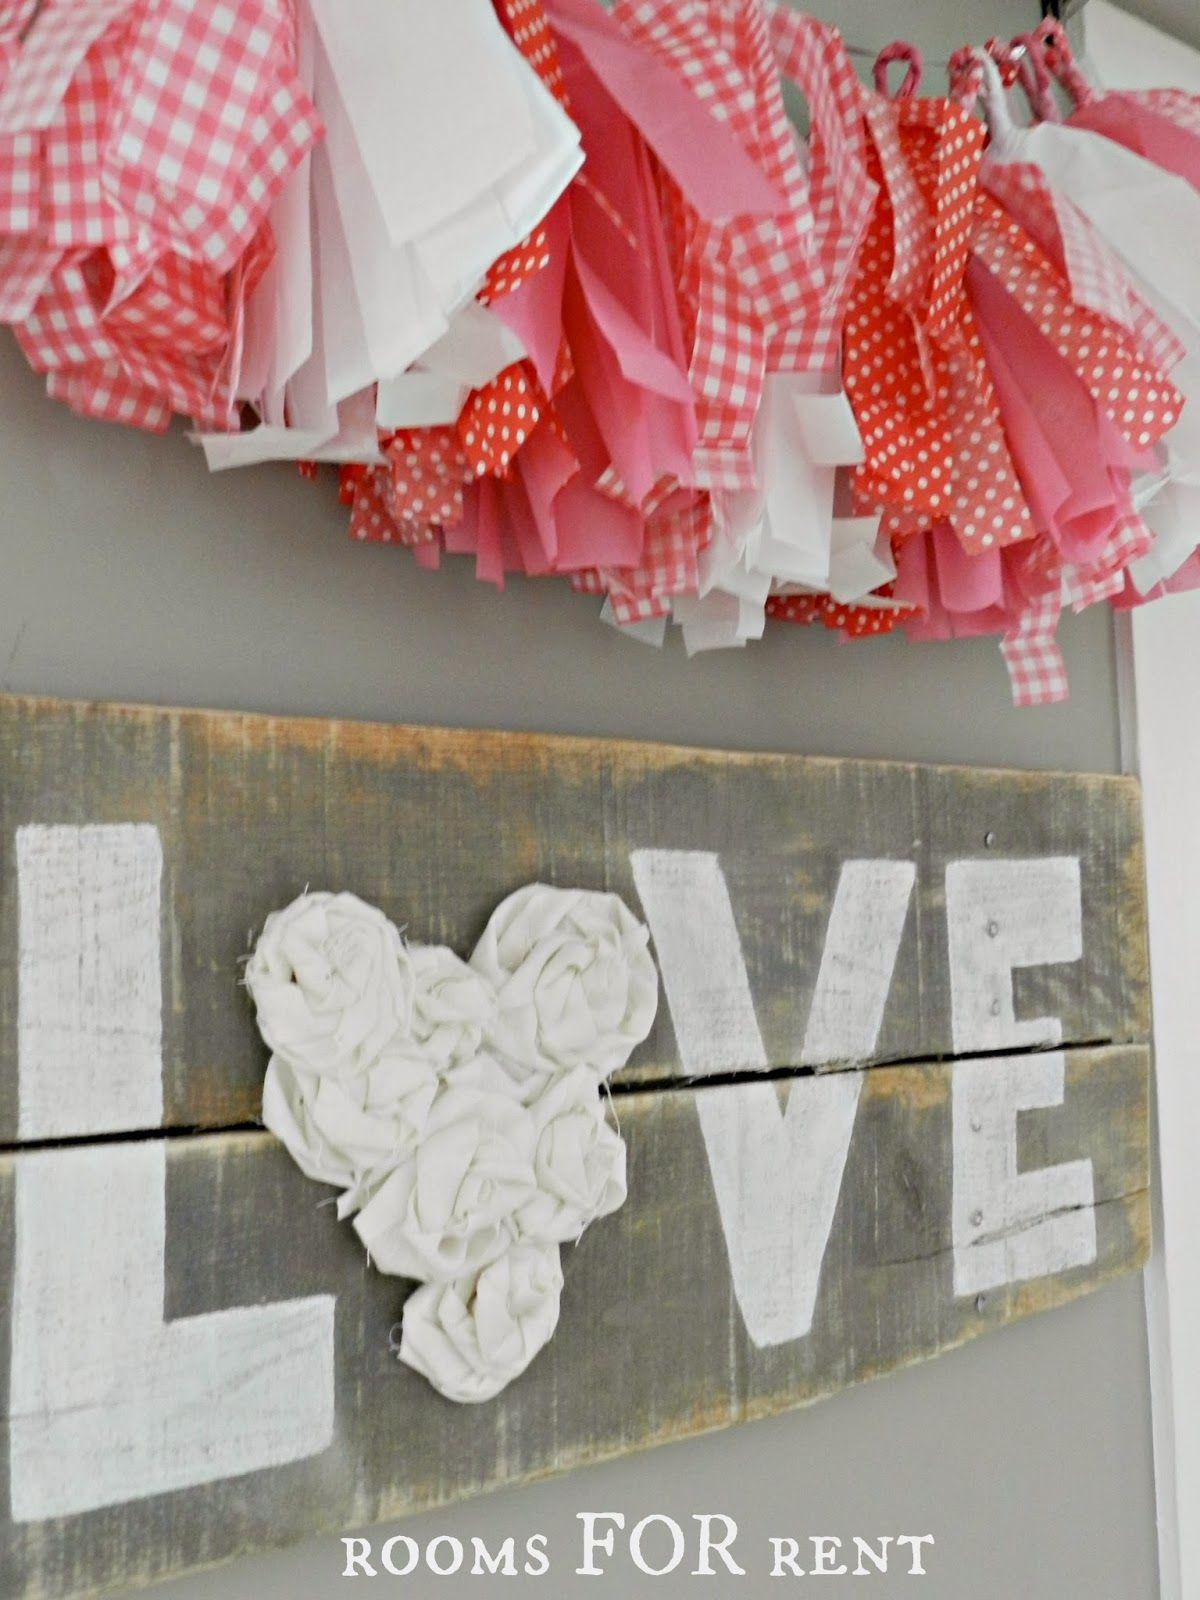 Rooms For Rent Diy Love Sign Diy Decor Crafts Love Signs Crafts